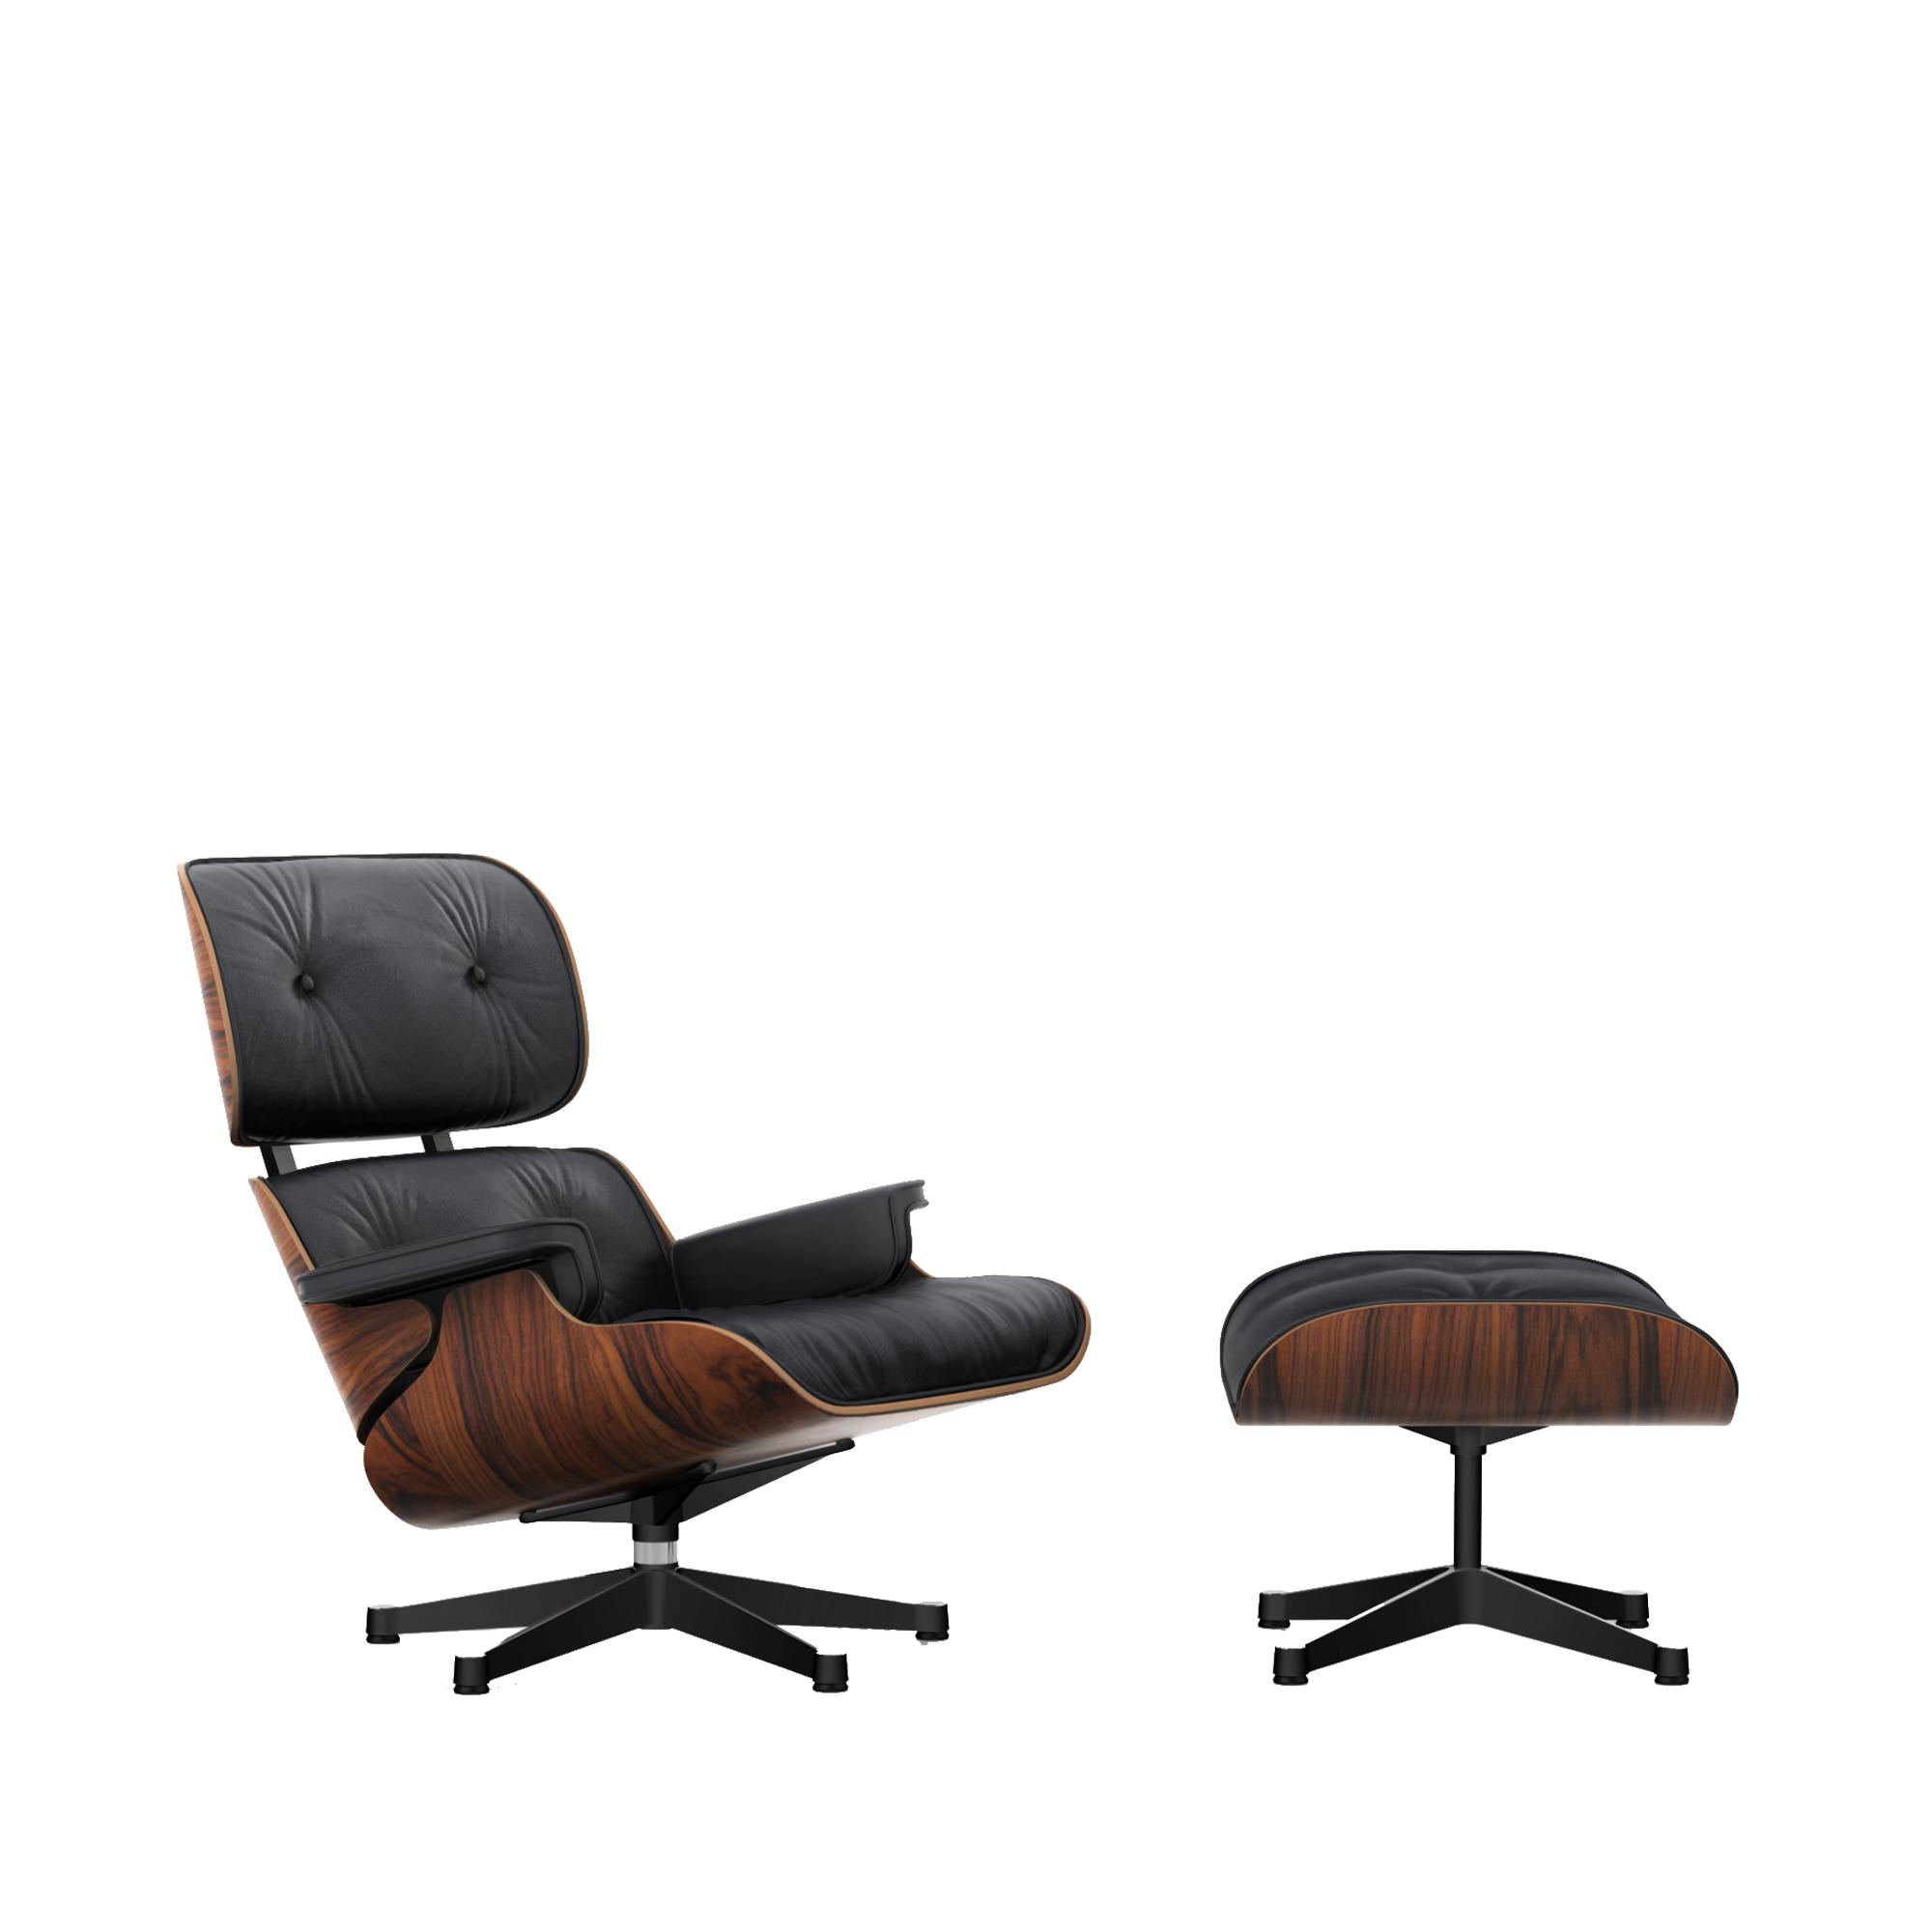 Vitra Sessel Eames Lounge Chair U0026 Ottoman Charles U0026 Ray Eames